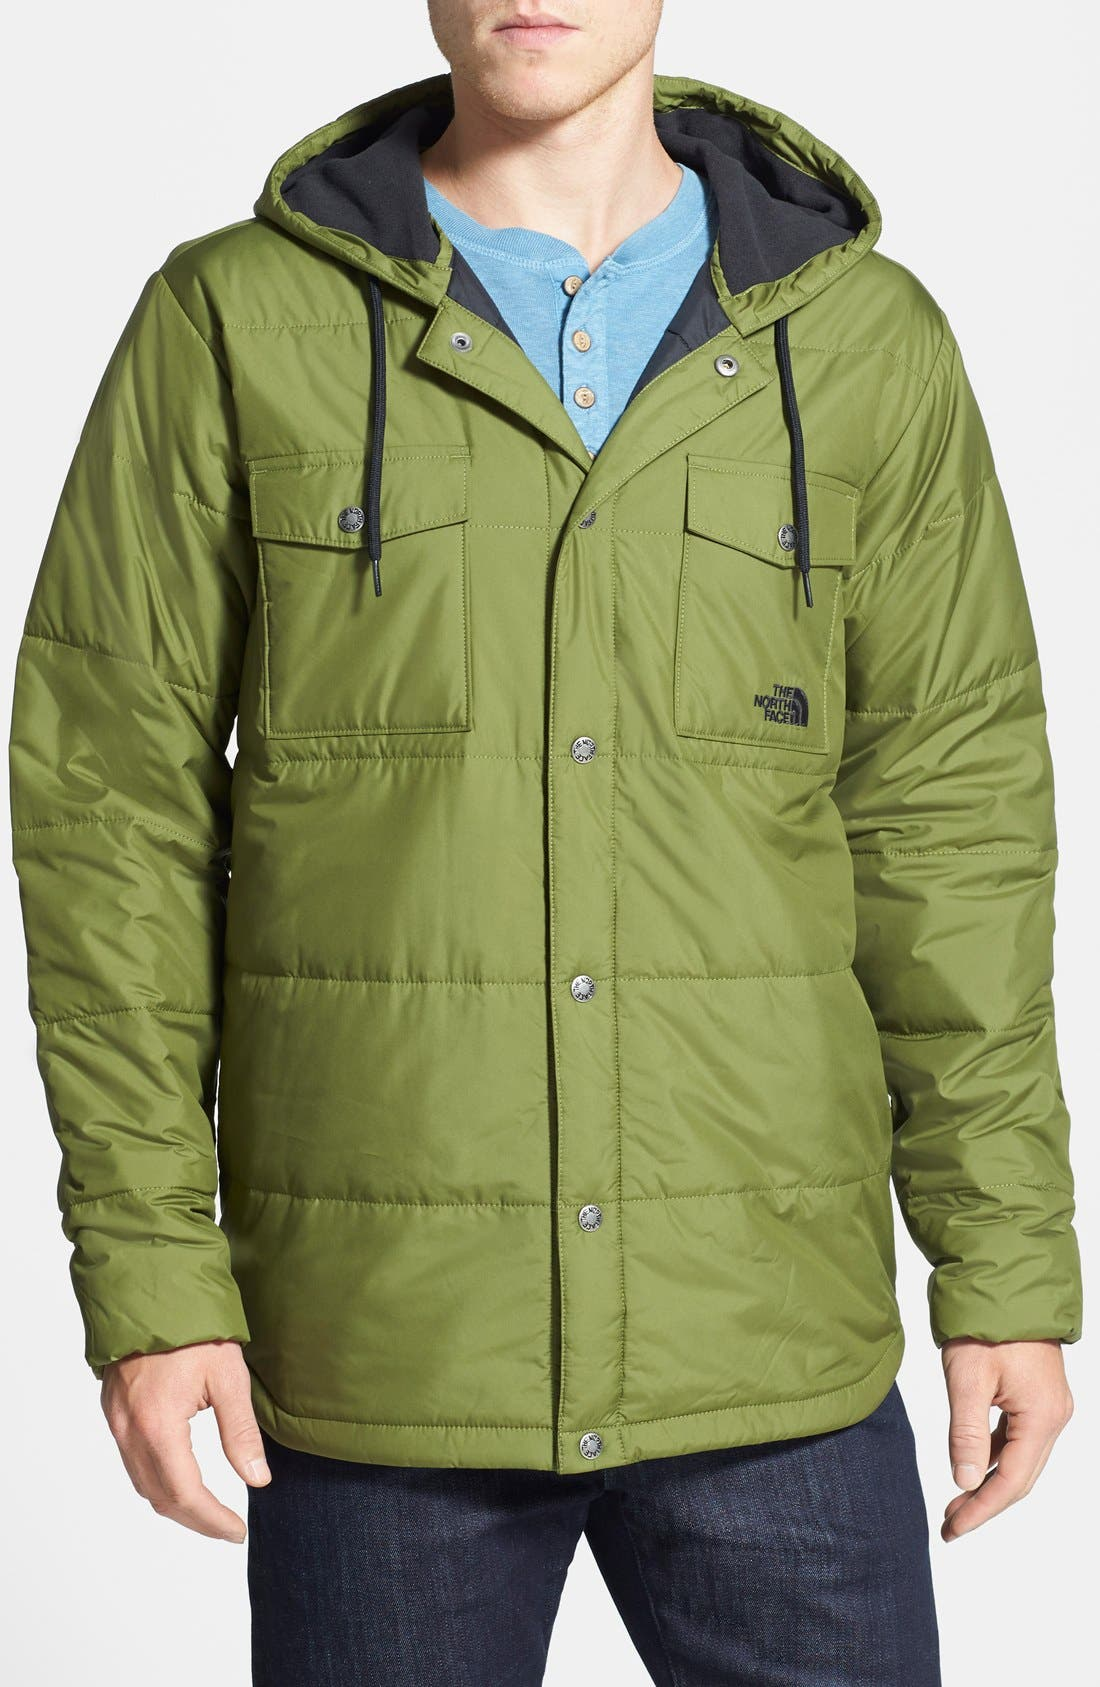 Main Image - The North Face 'Meeks' Water Resistant Heatseeker Insulated Jacket